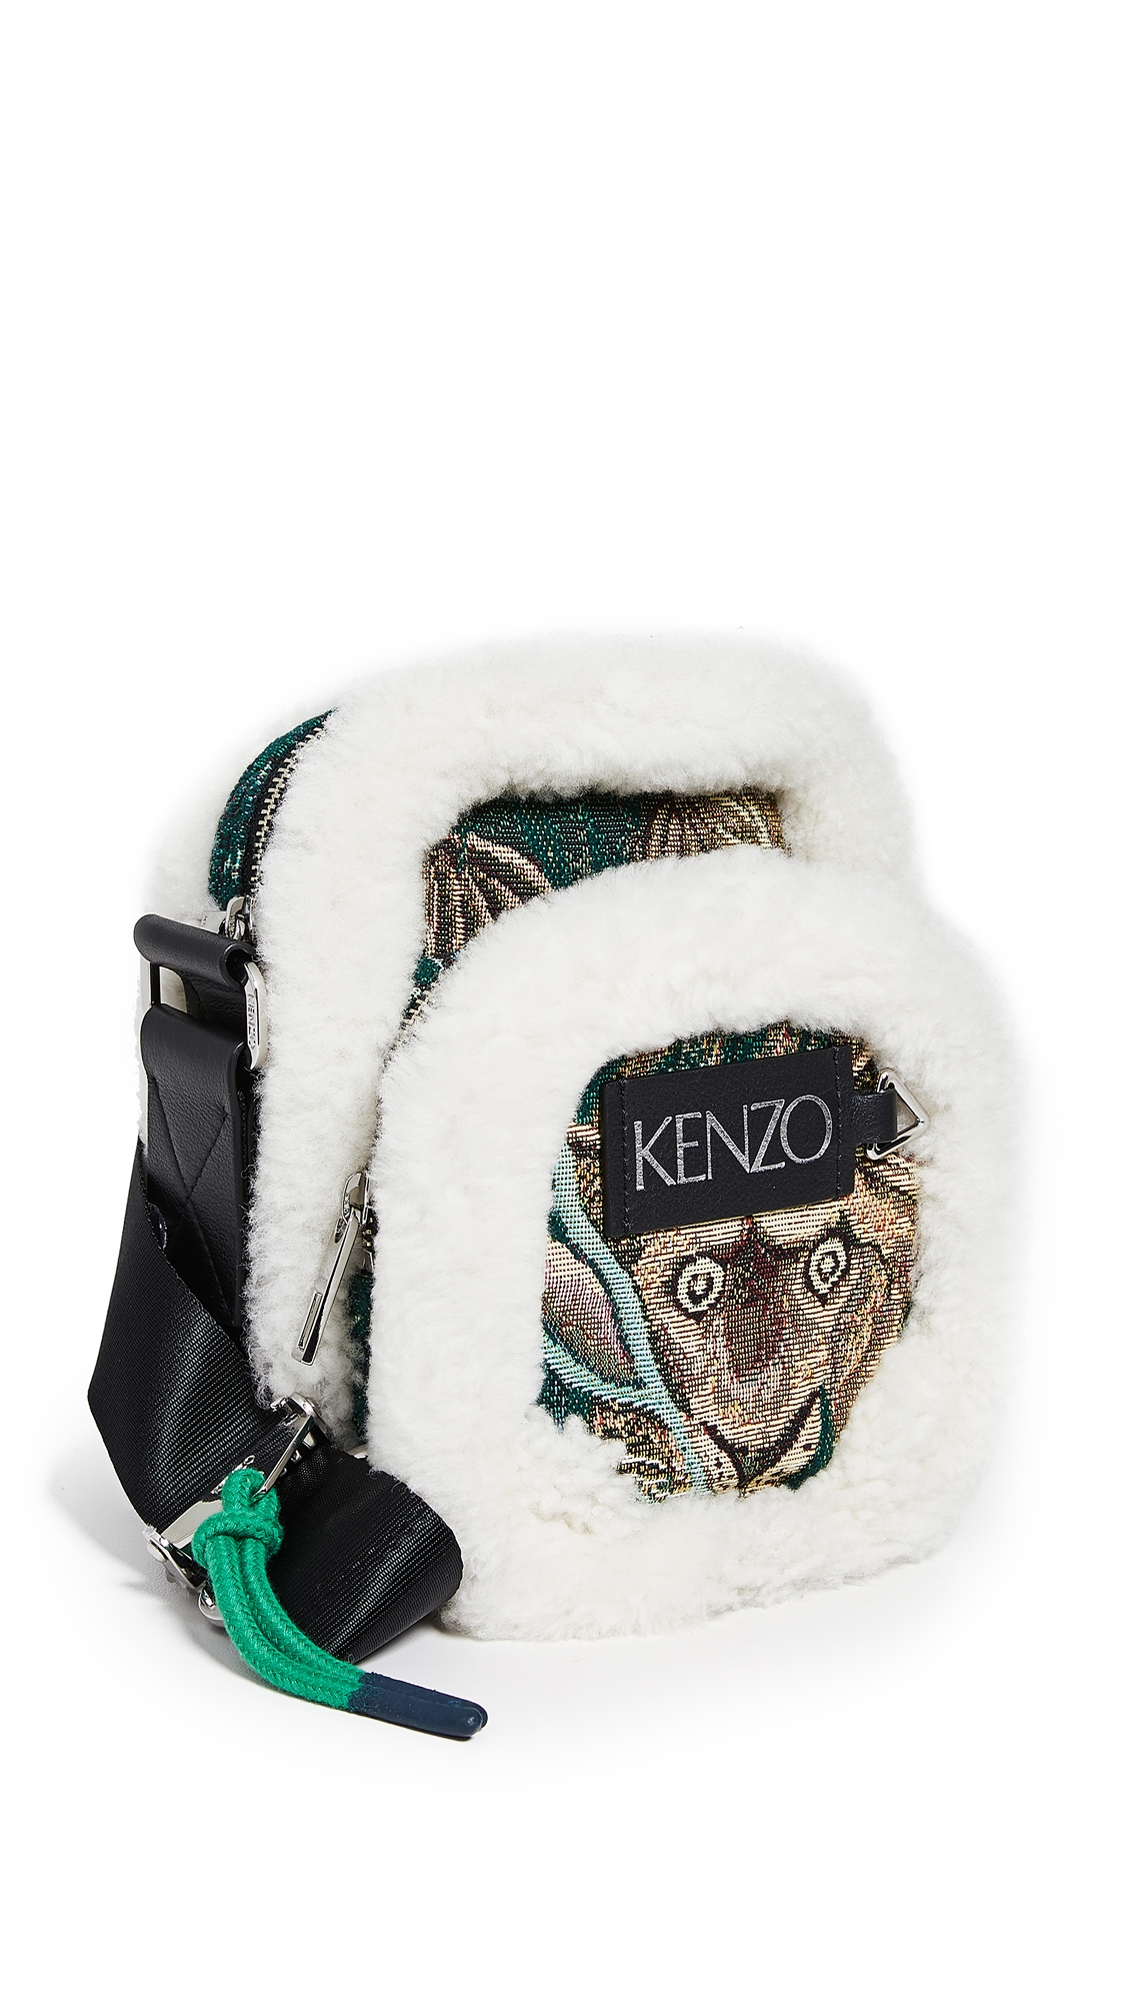 KENZO Memento Crossbody Shoulder Bag in 55Btlgreen